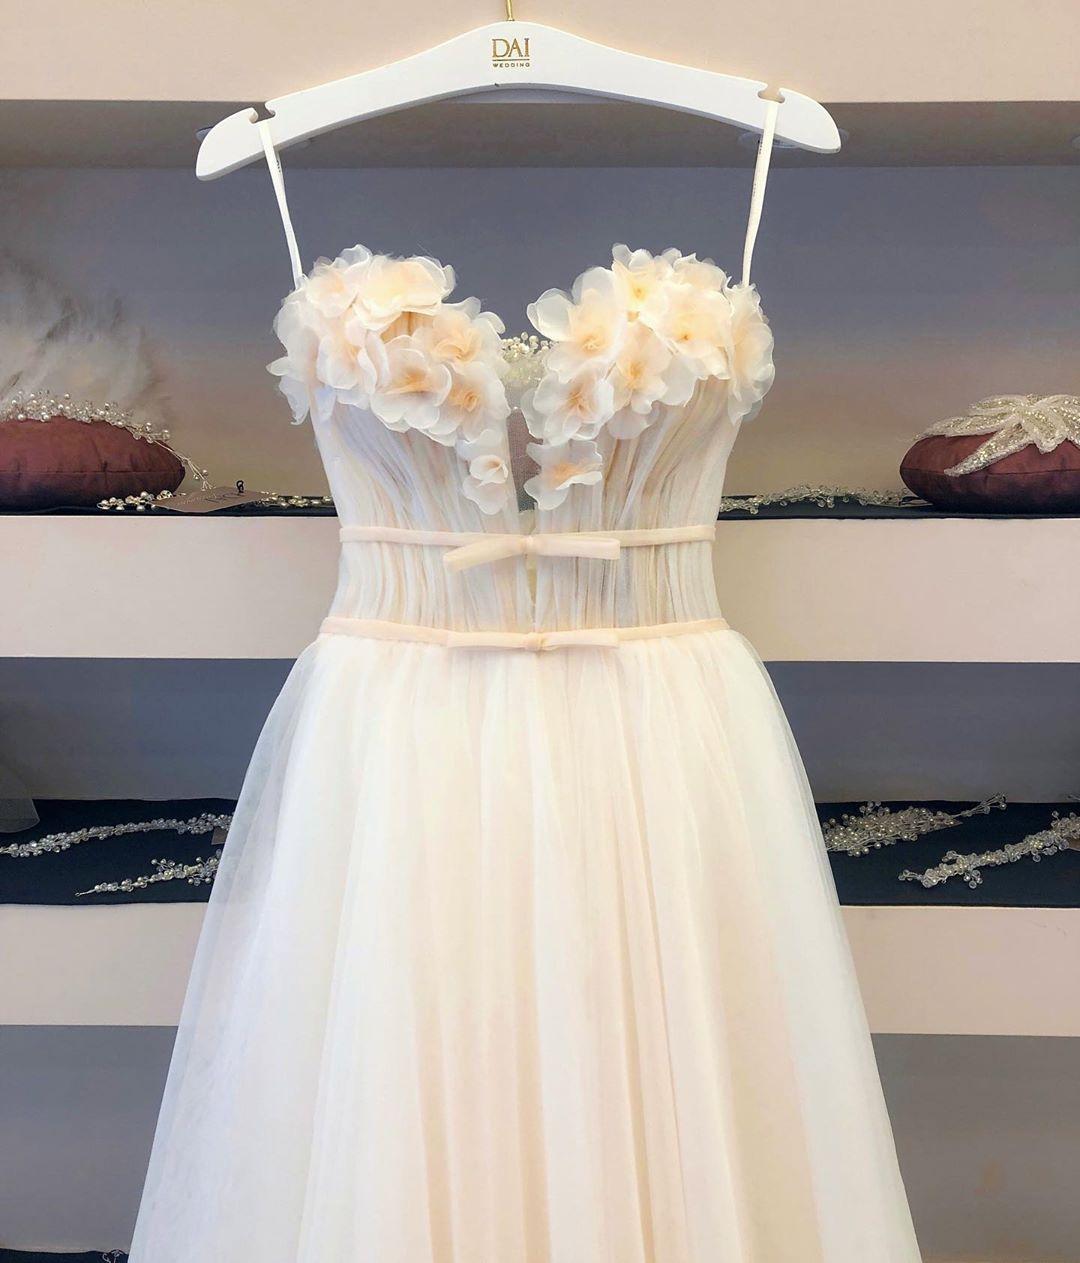 Dai Wedding On Instagram 2020 Zoya Dresses Wedding Dress Gallery Fashion Gowns [ 1263 x 1080 Pixel ]